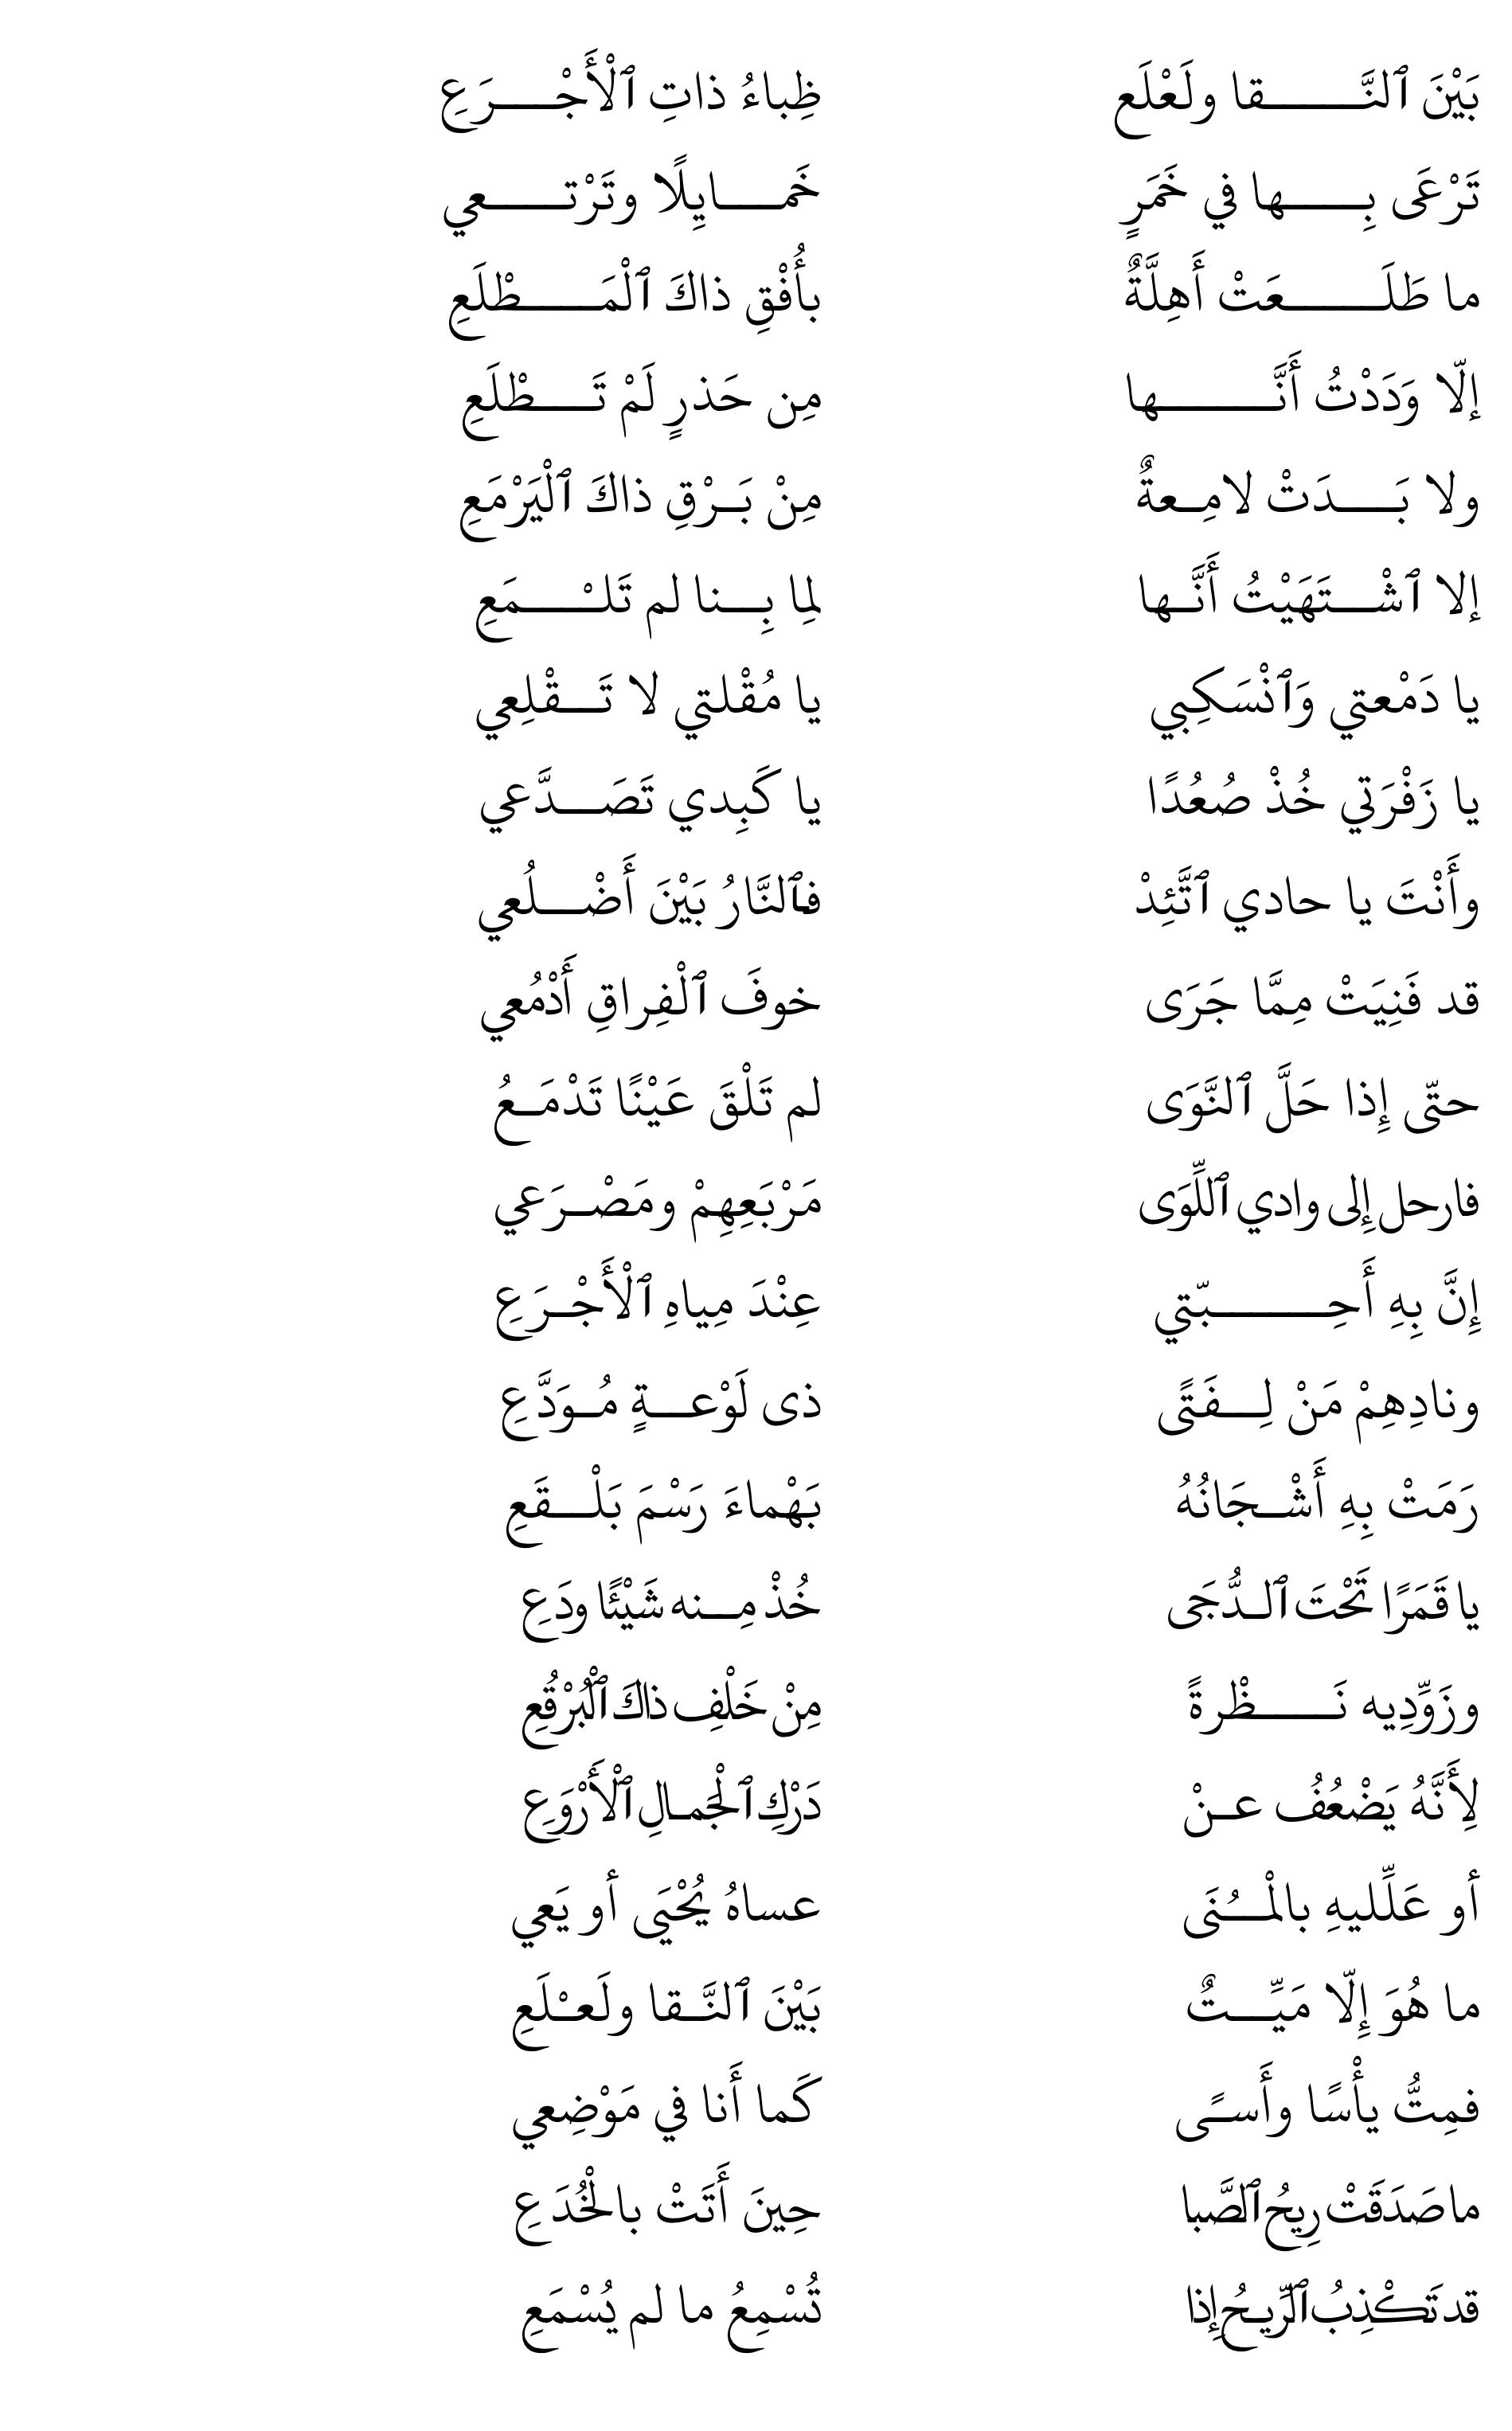 ibn-arabi-arabic-28-tentacular-magazine.png